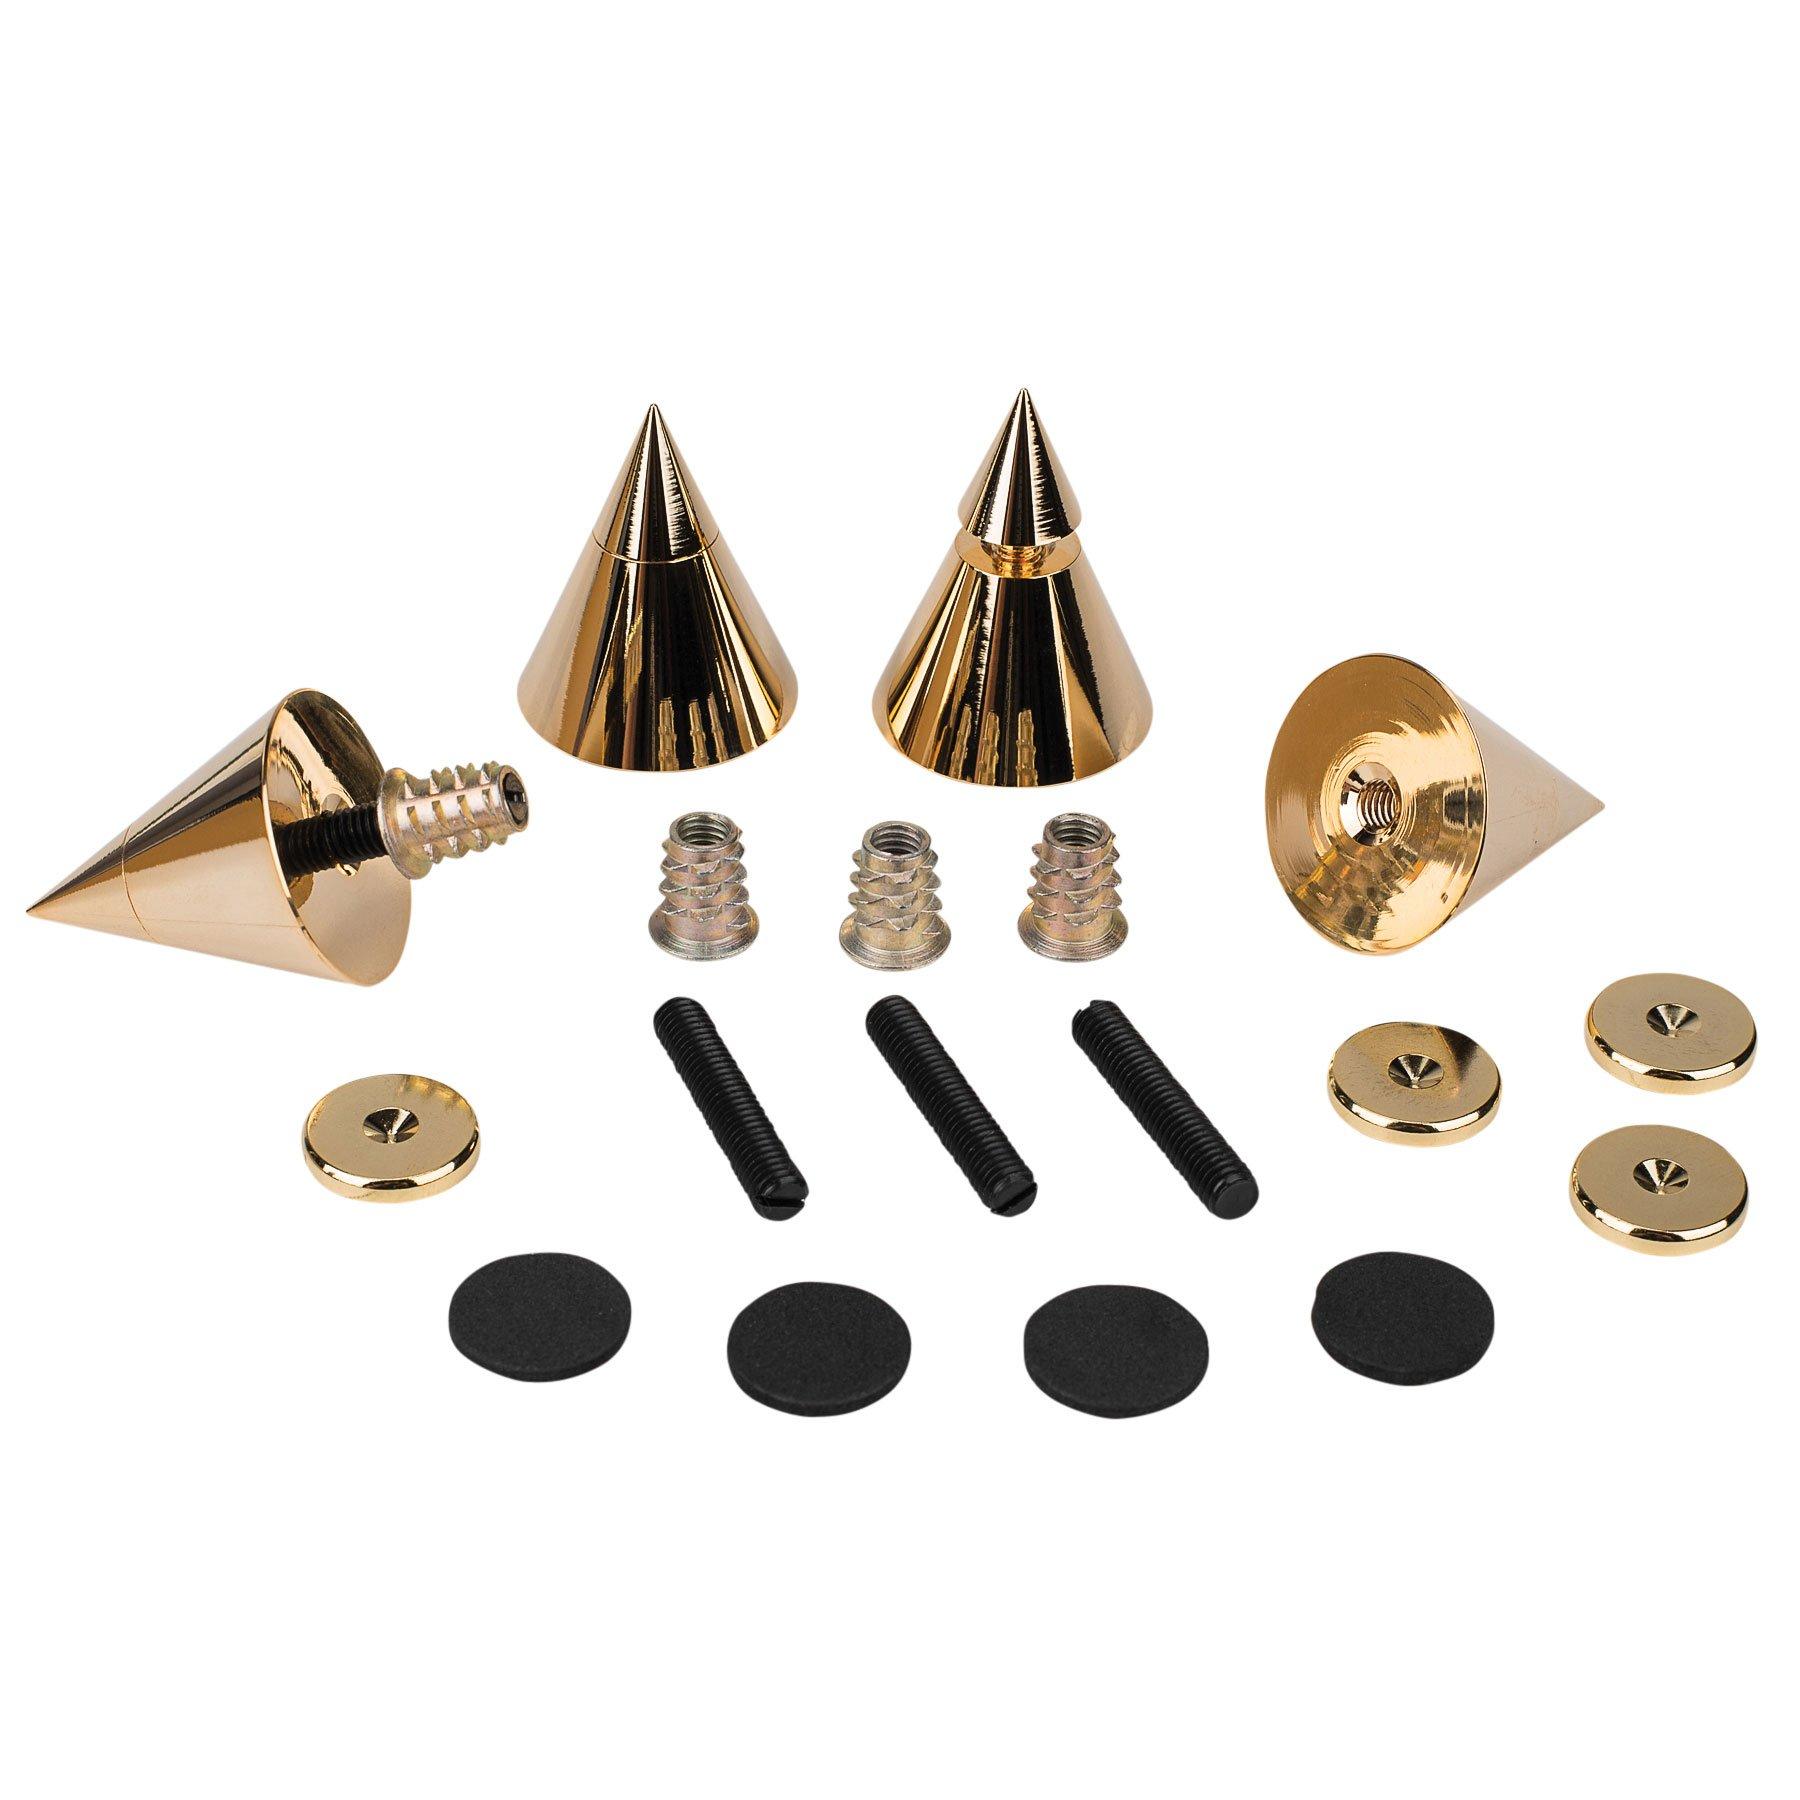 Dayton Audio DSS4-G Gold Speaker Spike Set 4 Pcs. by Dayton Audio